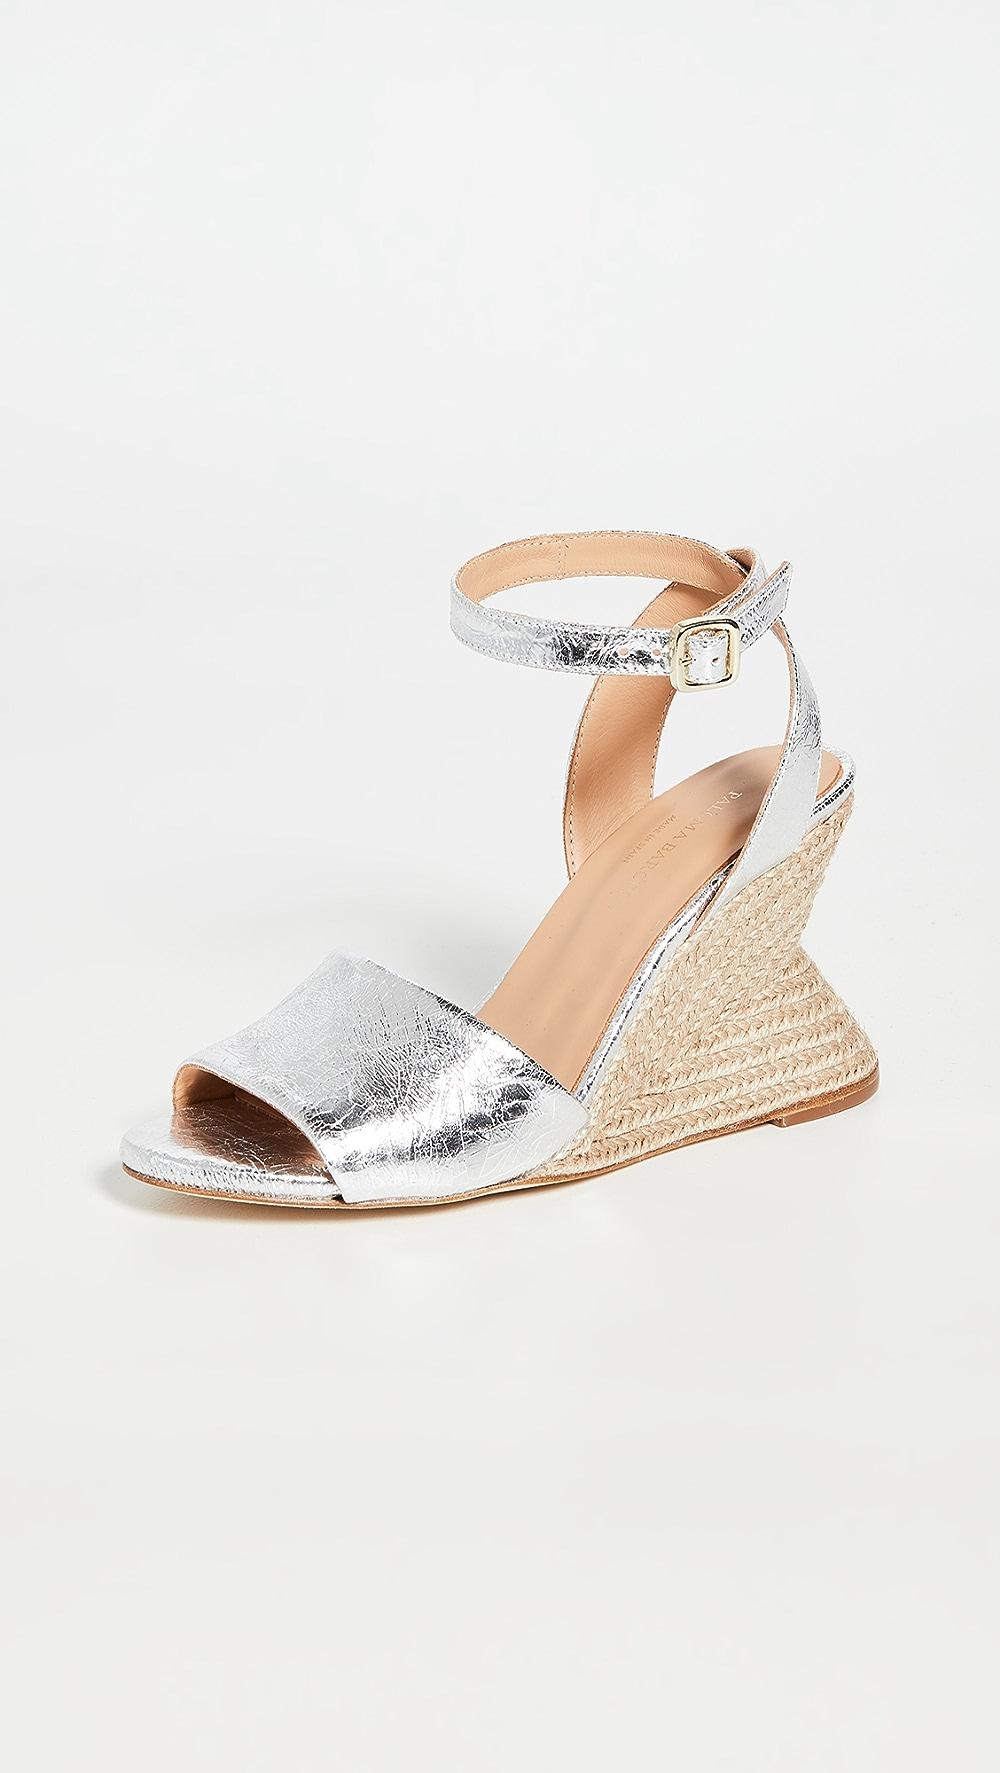 Strict Paloma Barcelo - Castula Wedge Sandals Cheap Sales